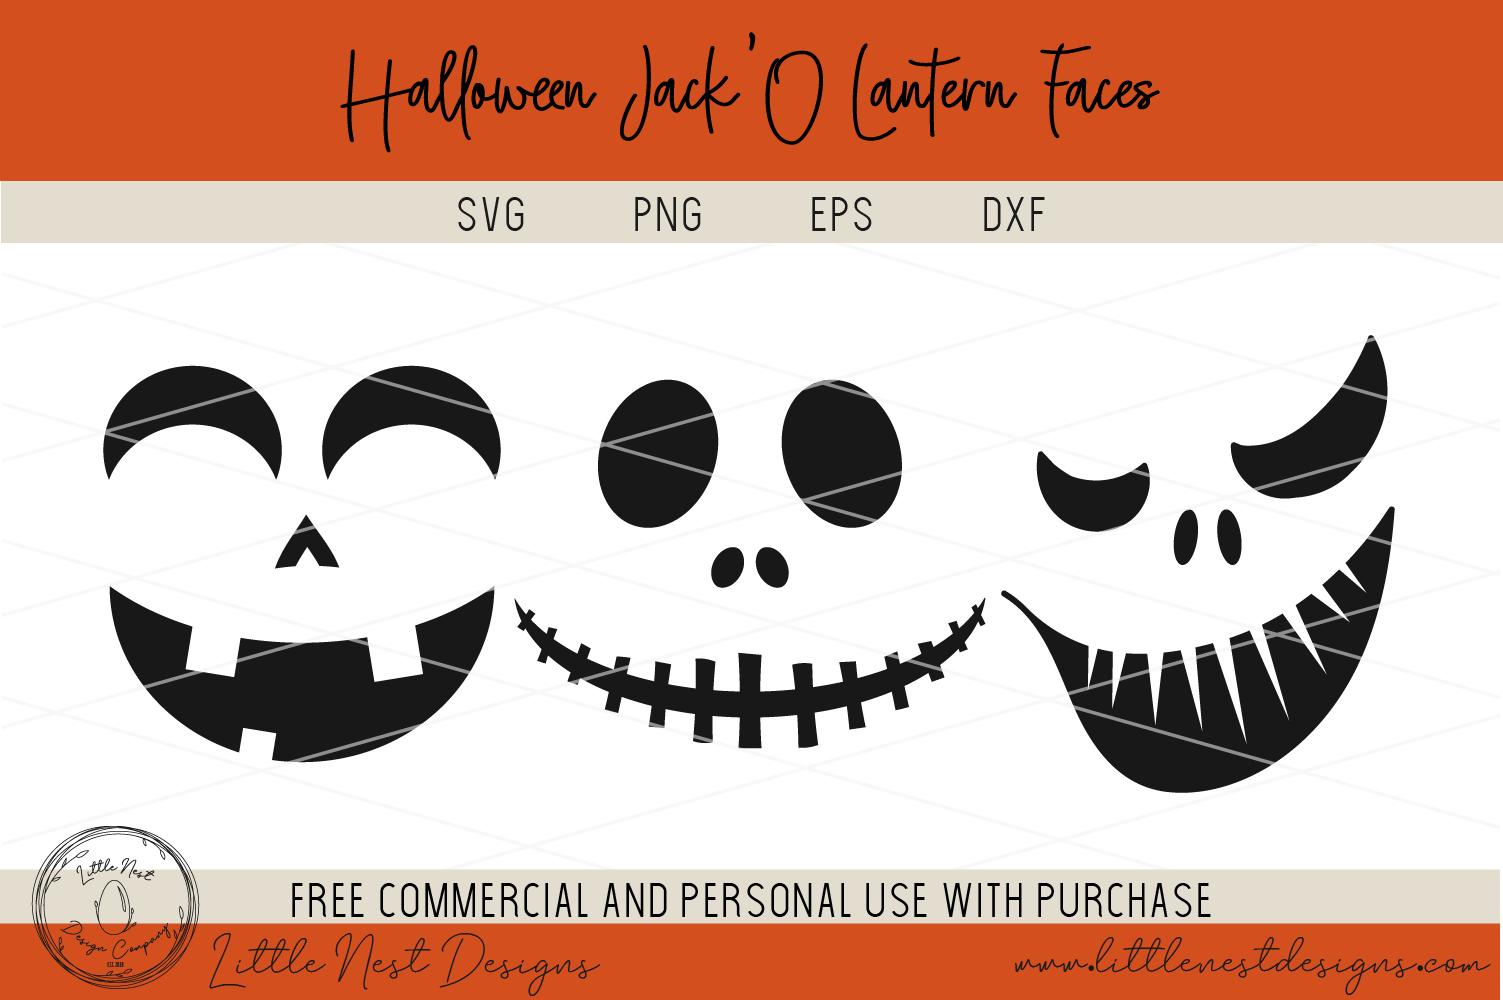 Halloween Jack O Lantern Faces - Pumpkin Faces - SVG Pumpkin example image 3